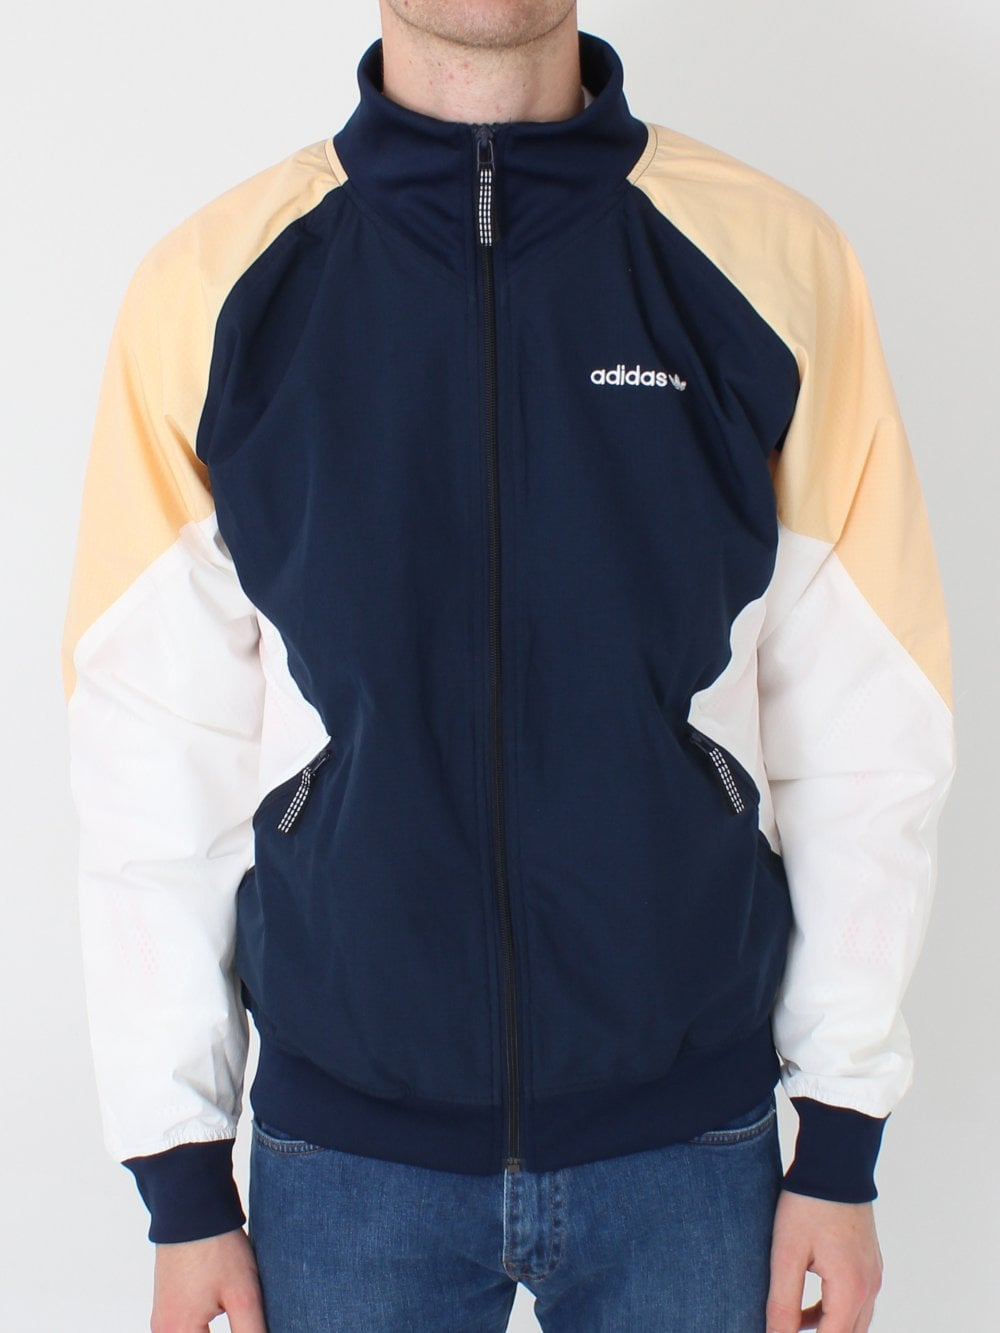 89b057133966 Adidas EQT Polar Jacket in Navy